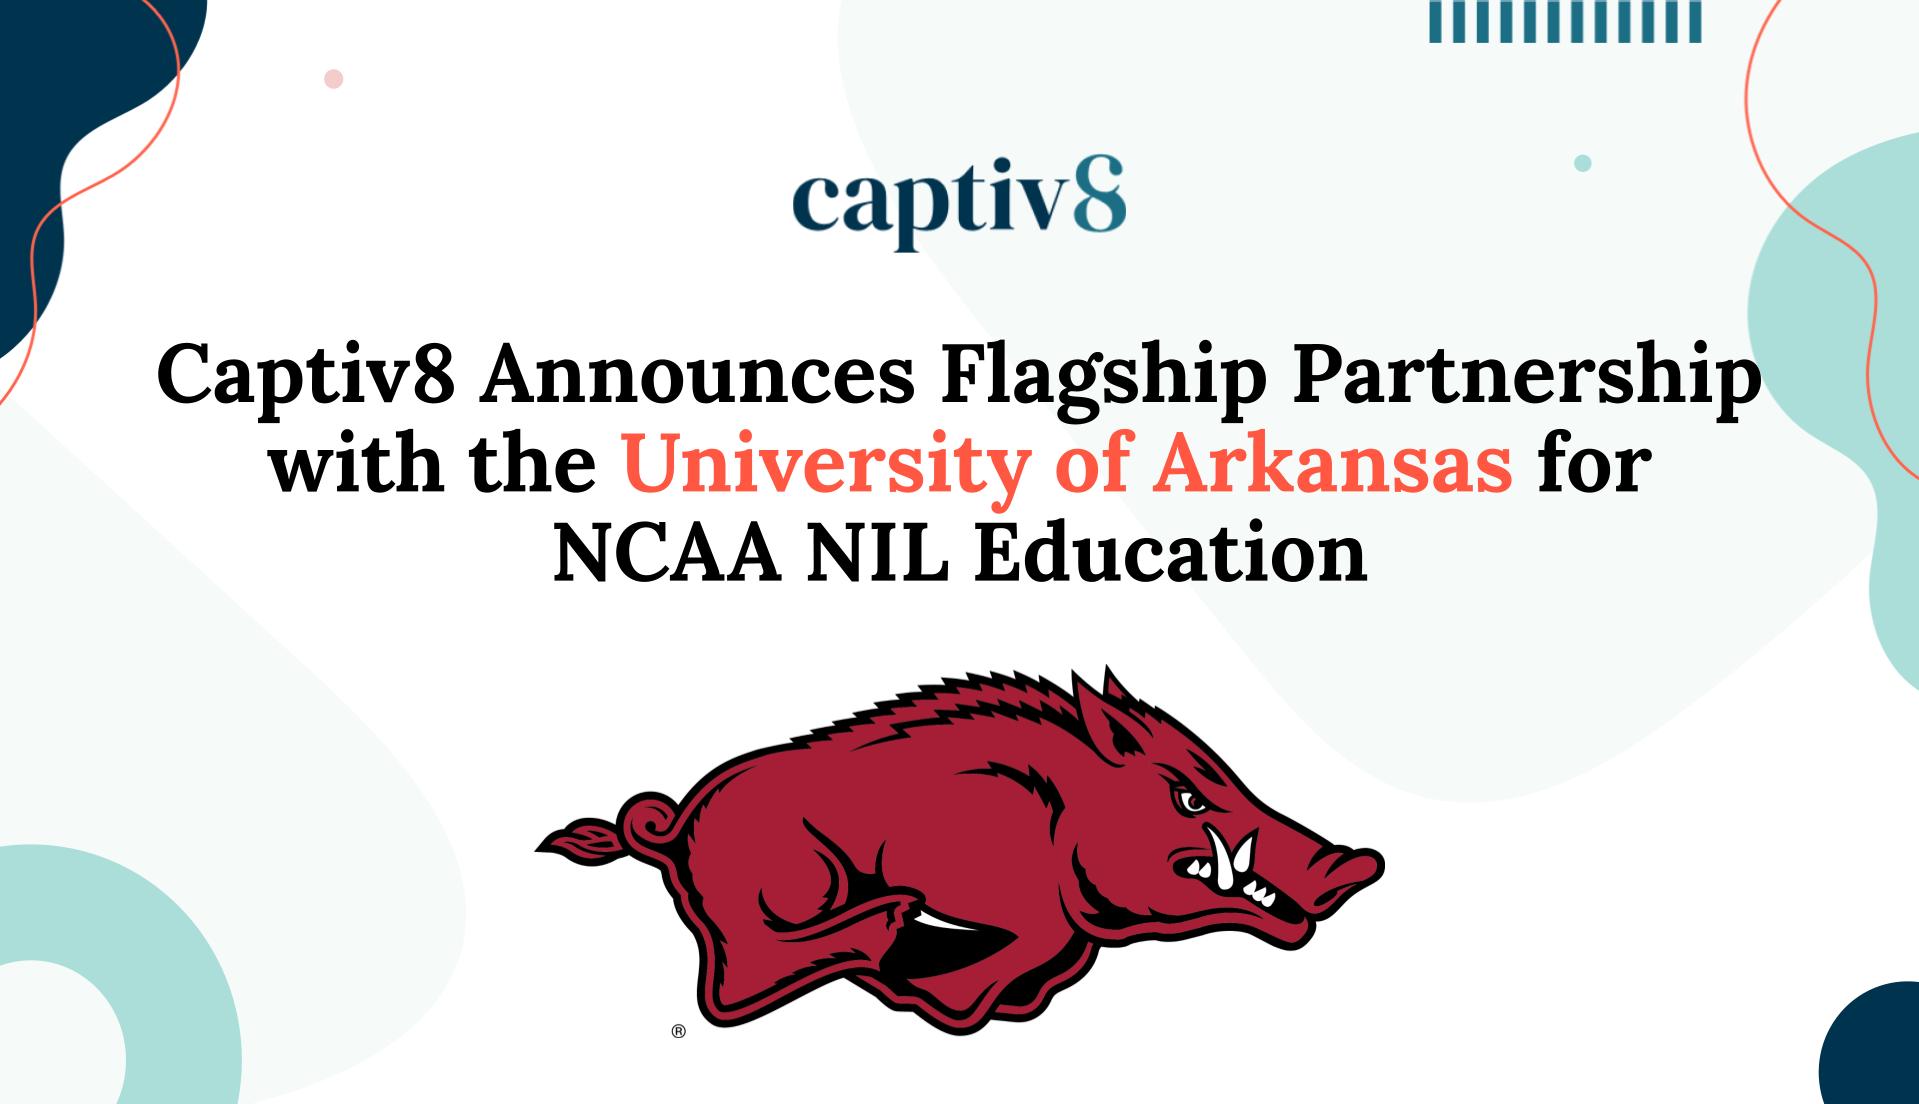 University of Arkansas Announcement Banner